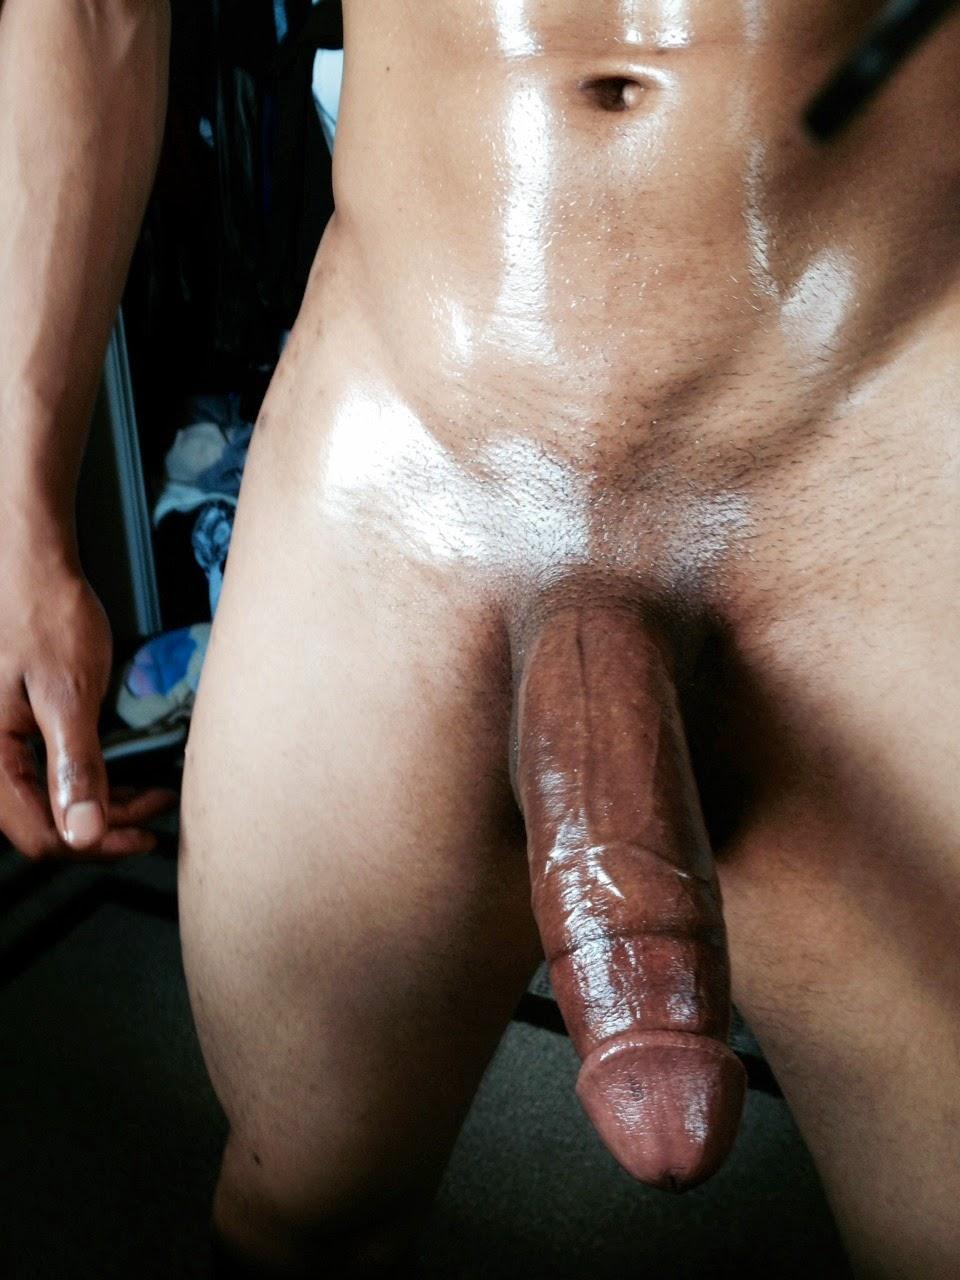 huge uncut cock cum gay